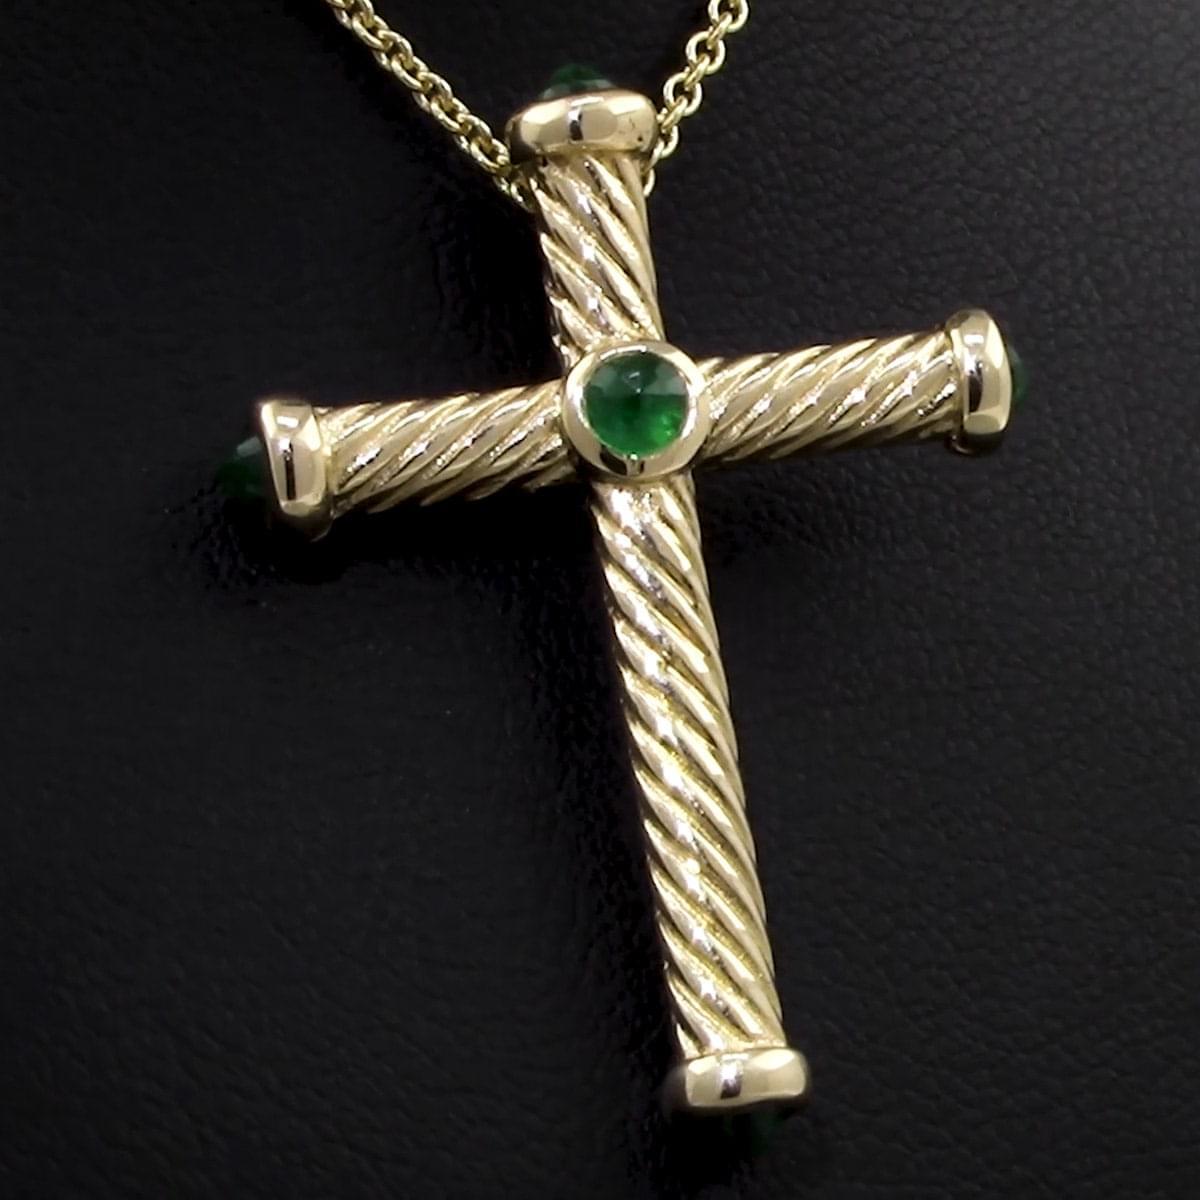 Emerald Ruby Cross Pendant On Chain